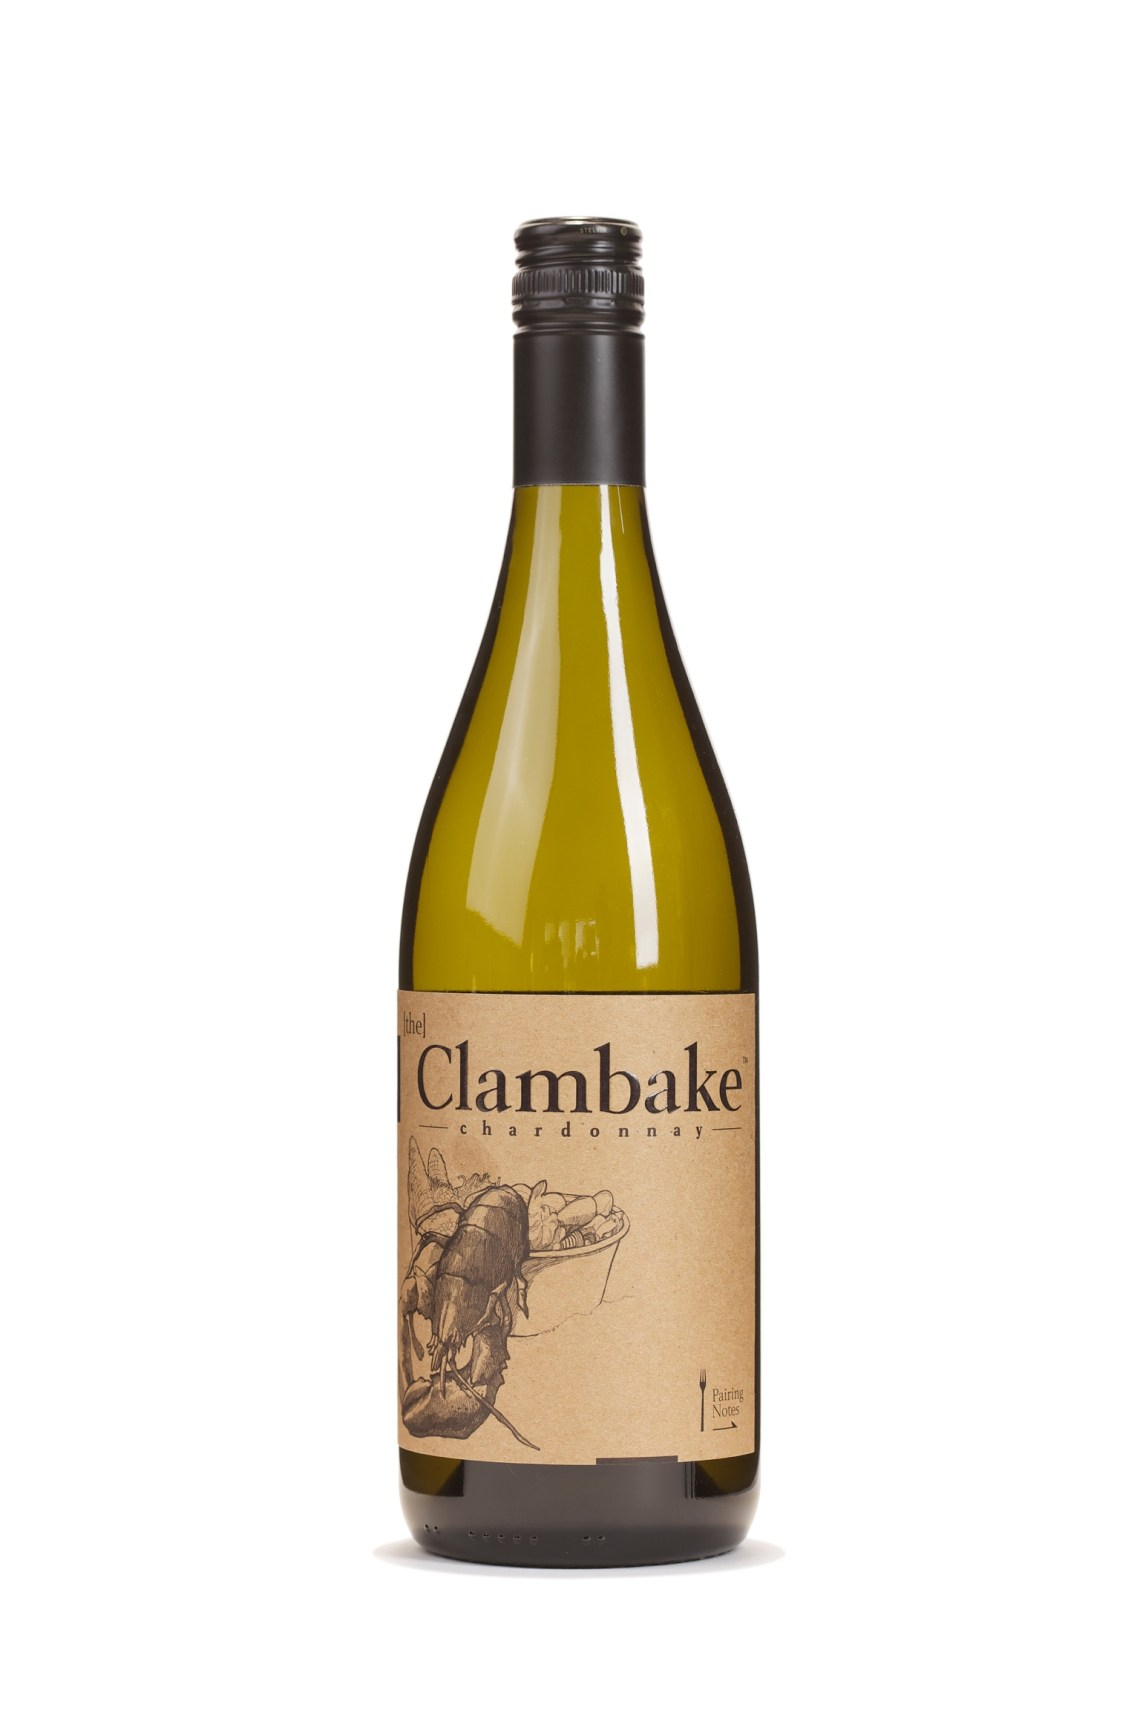 2014 The Clambake Unoaked Chardonnay Mendocino